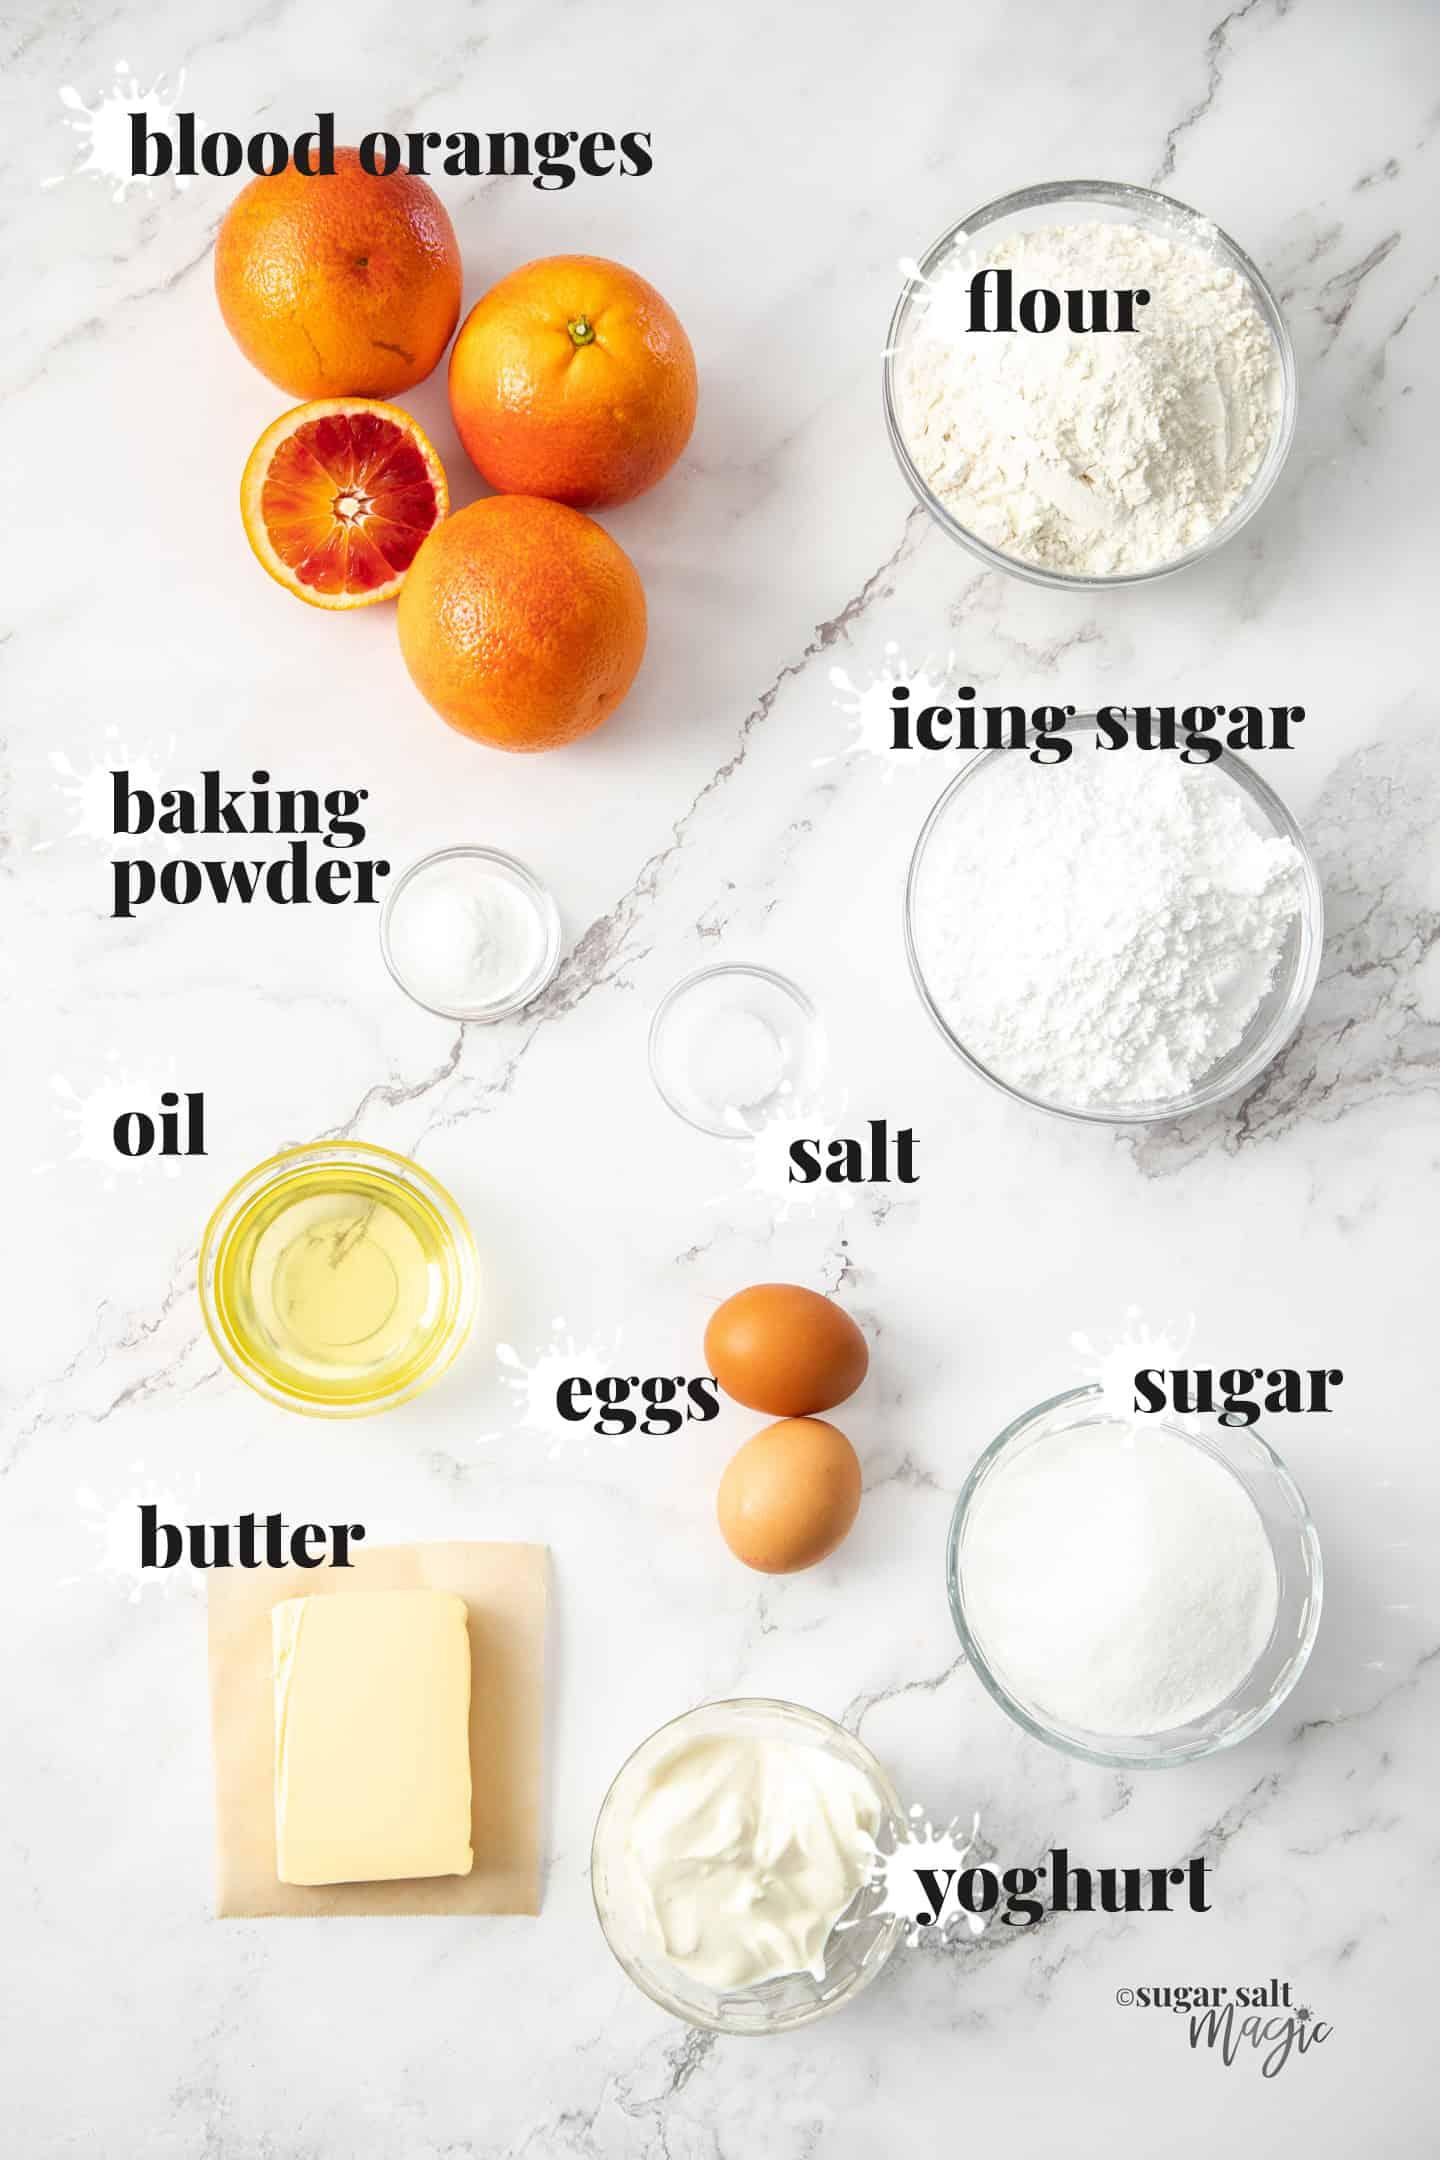 Ingredients for blood orange loaf cake on a marble benchtop.